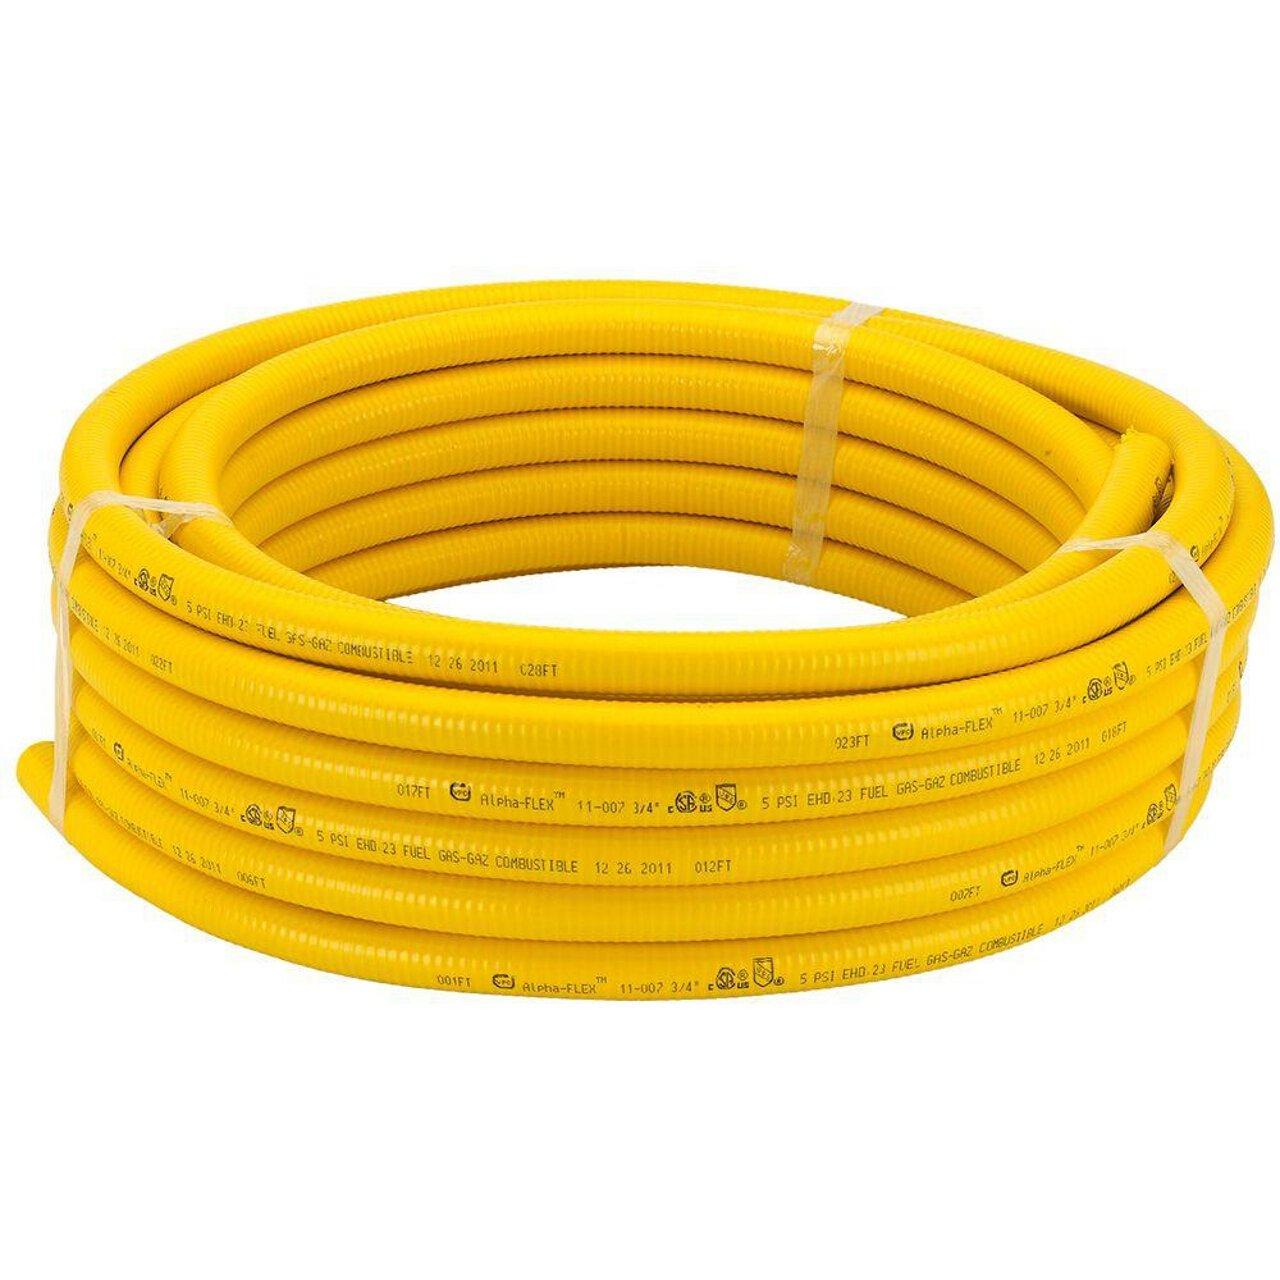 HomeFlex 11-00775 3/4-Inch x 75-Feet Corrugated Tubing, Stainless Steel by HomeFlex